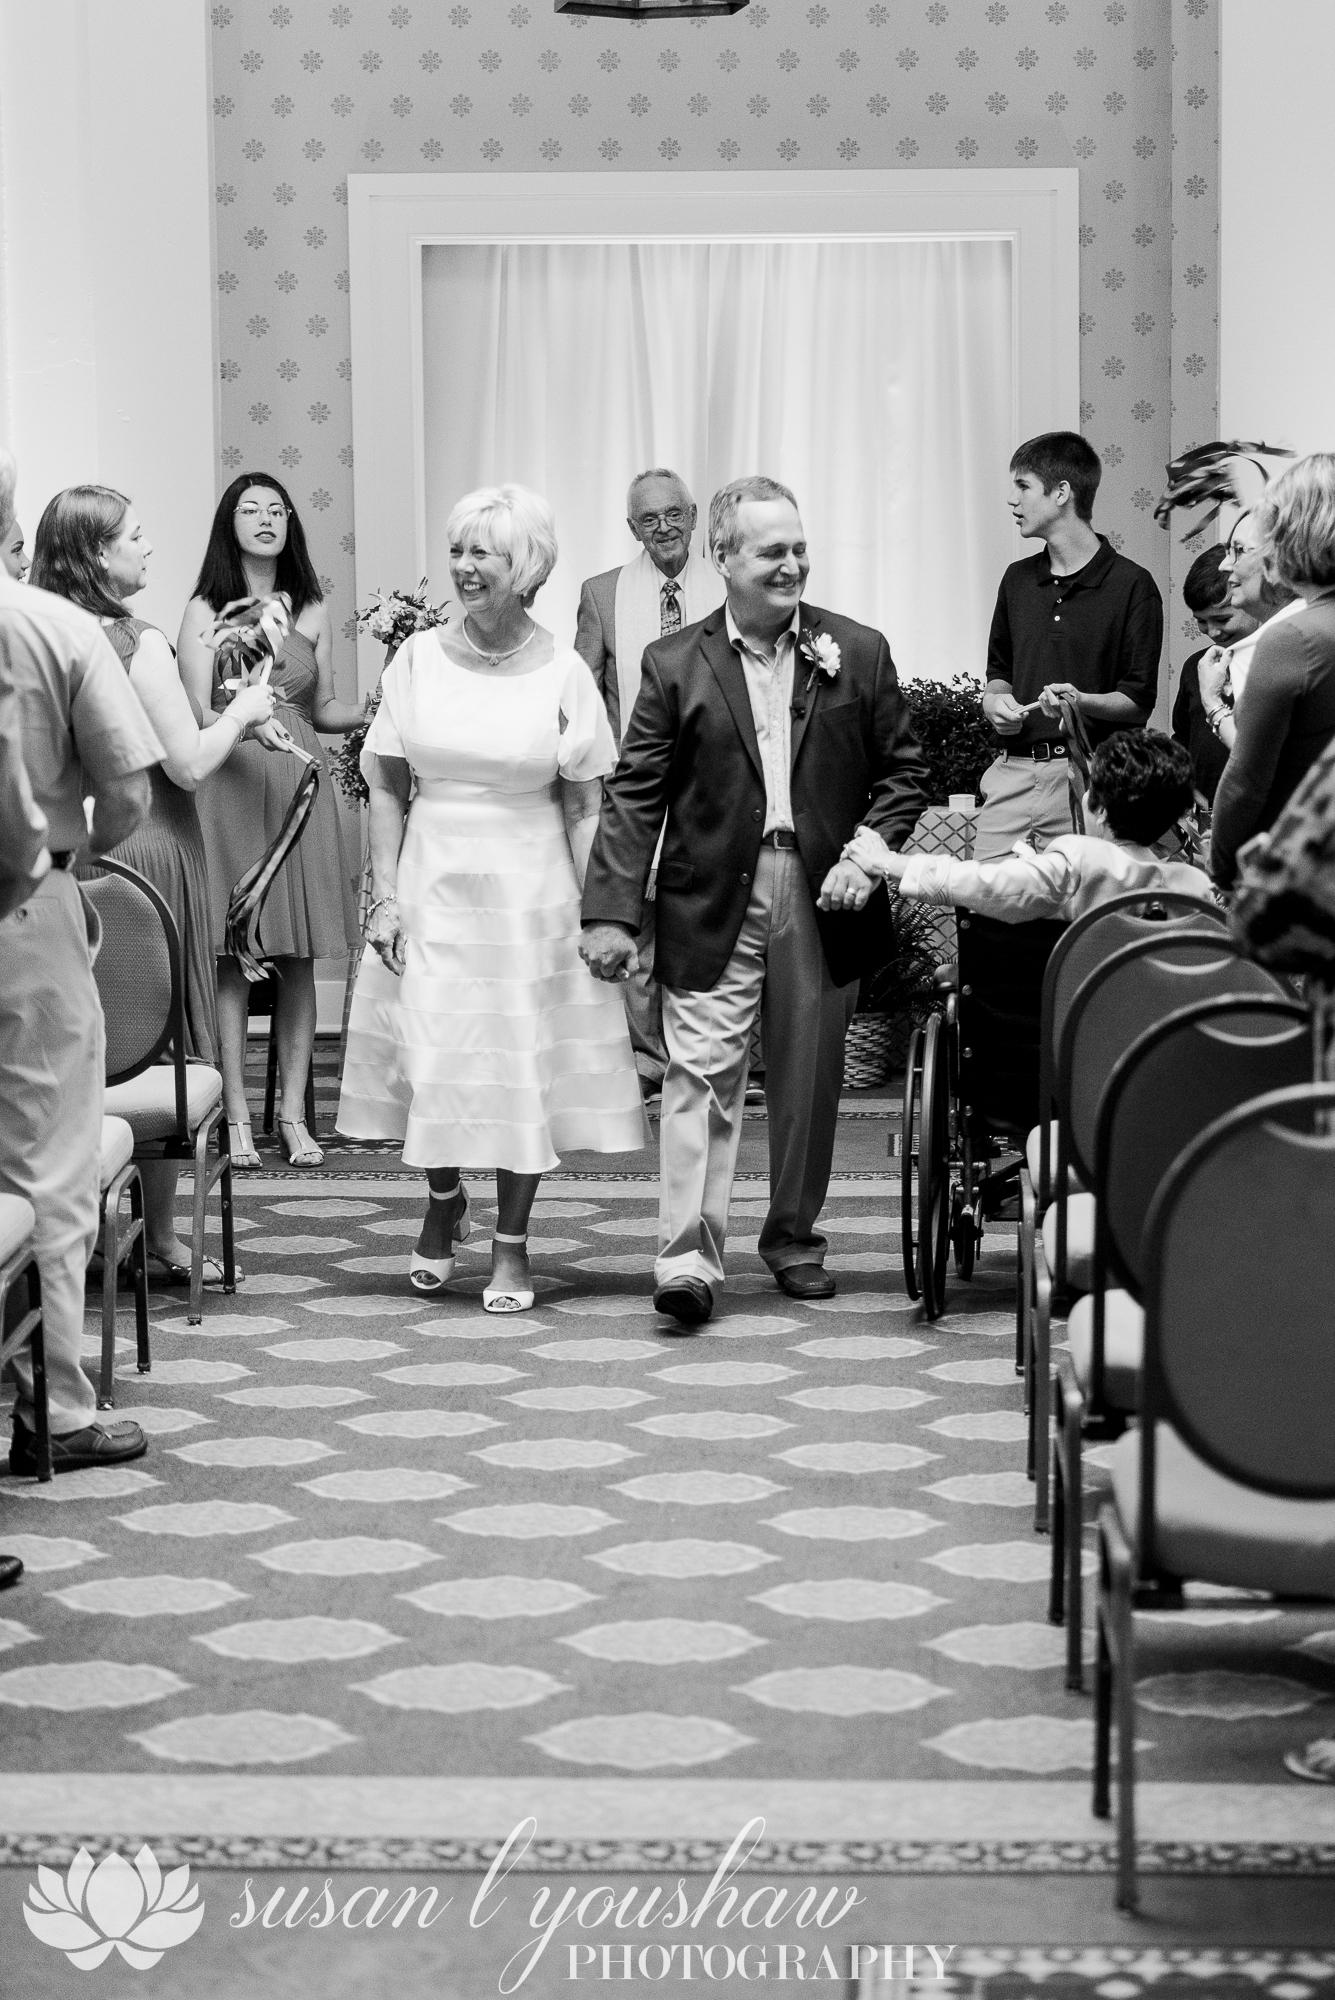 BLOG Carolyn Adams and Jim McCune 07-04-2018 SLY Photography-101.jpg